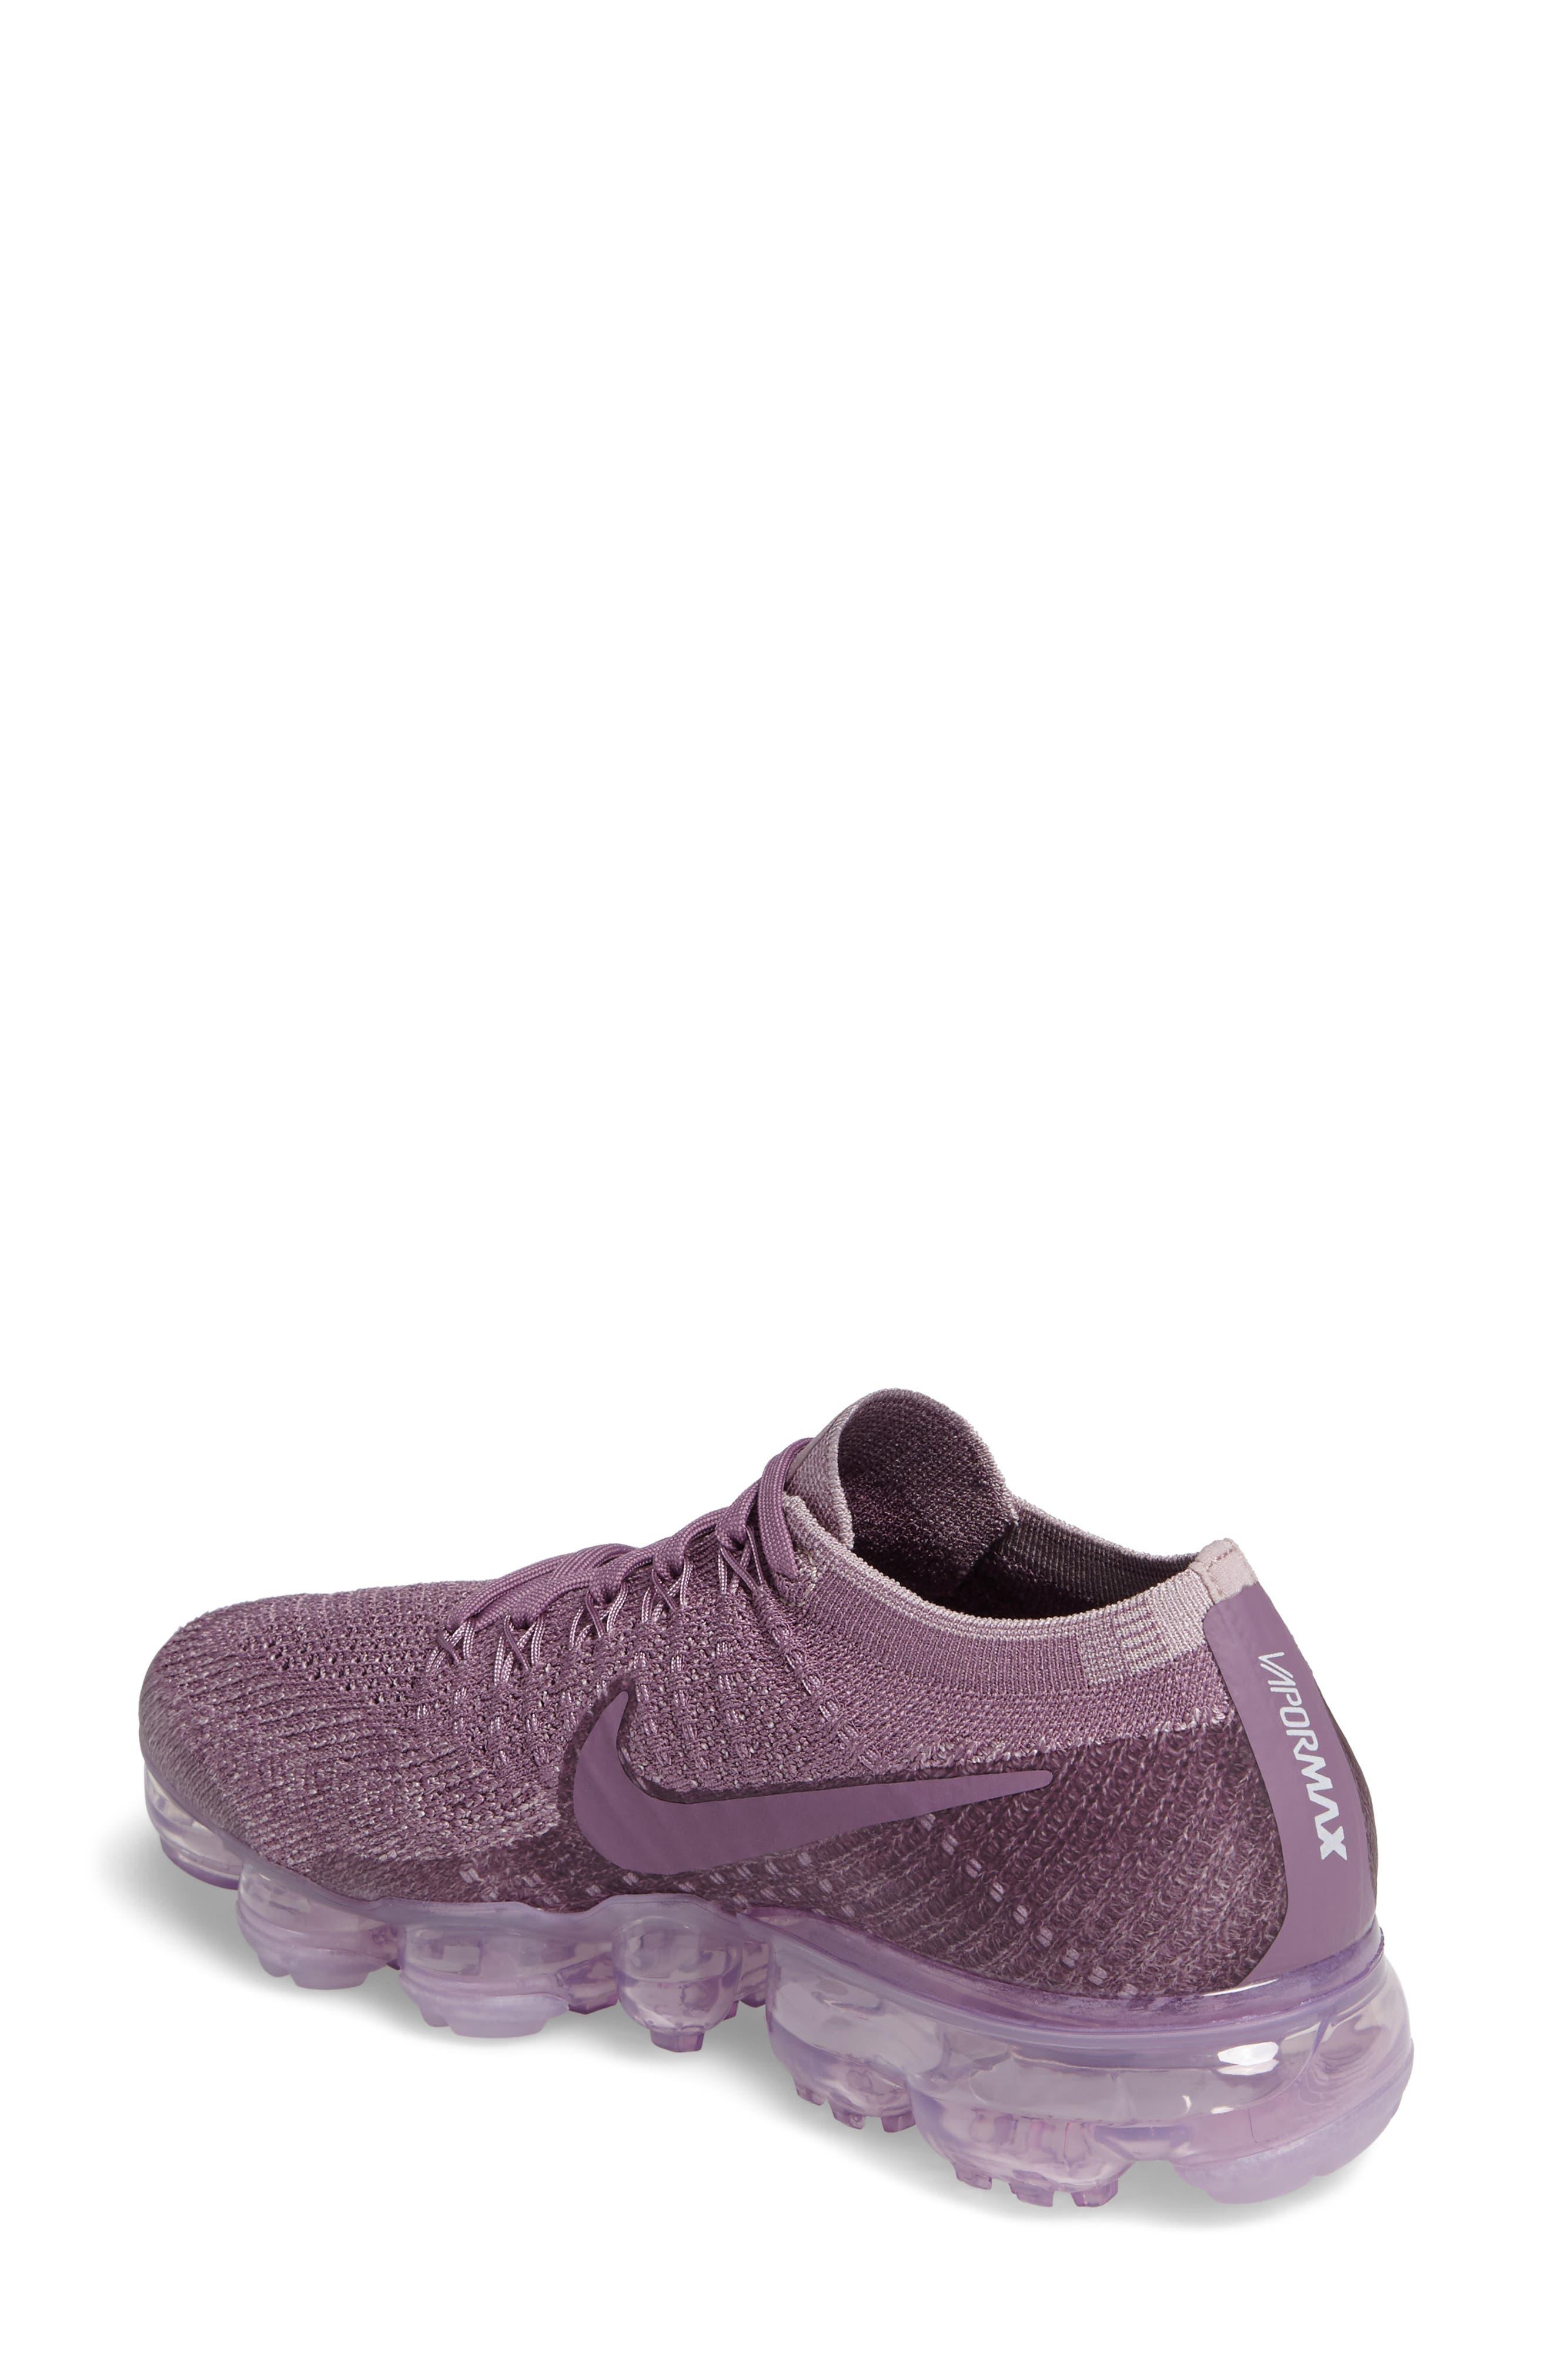 Air VaporMax Flyknit Running Shoe,                             Alternate thumbnail 2, color,                             Violet Dust/ Plum Fog